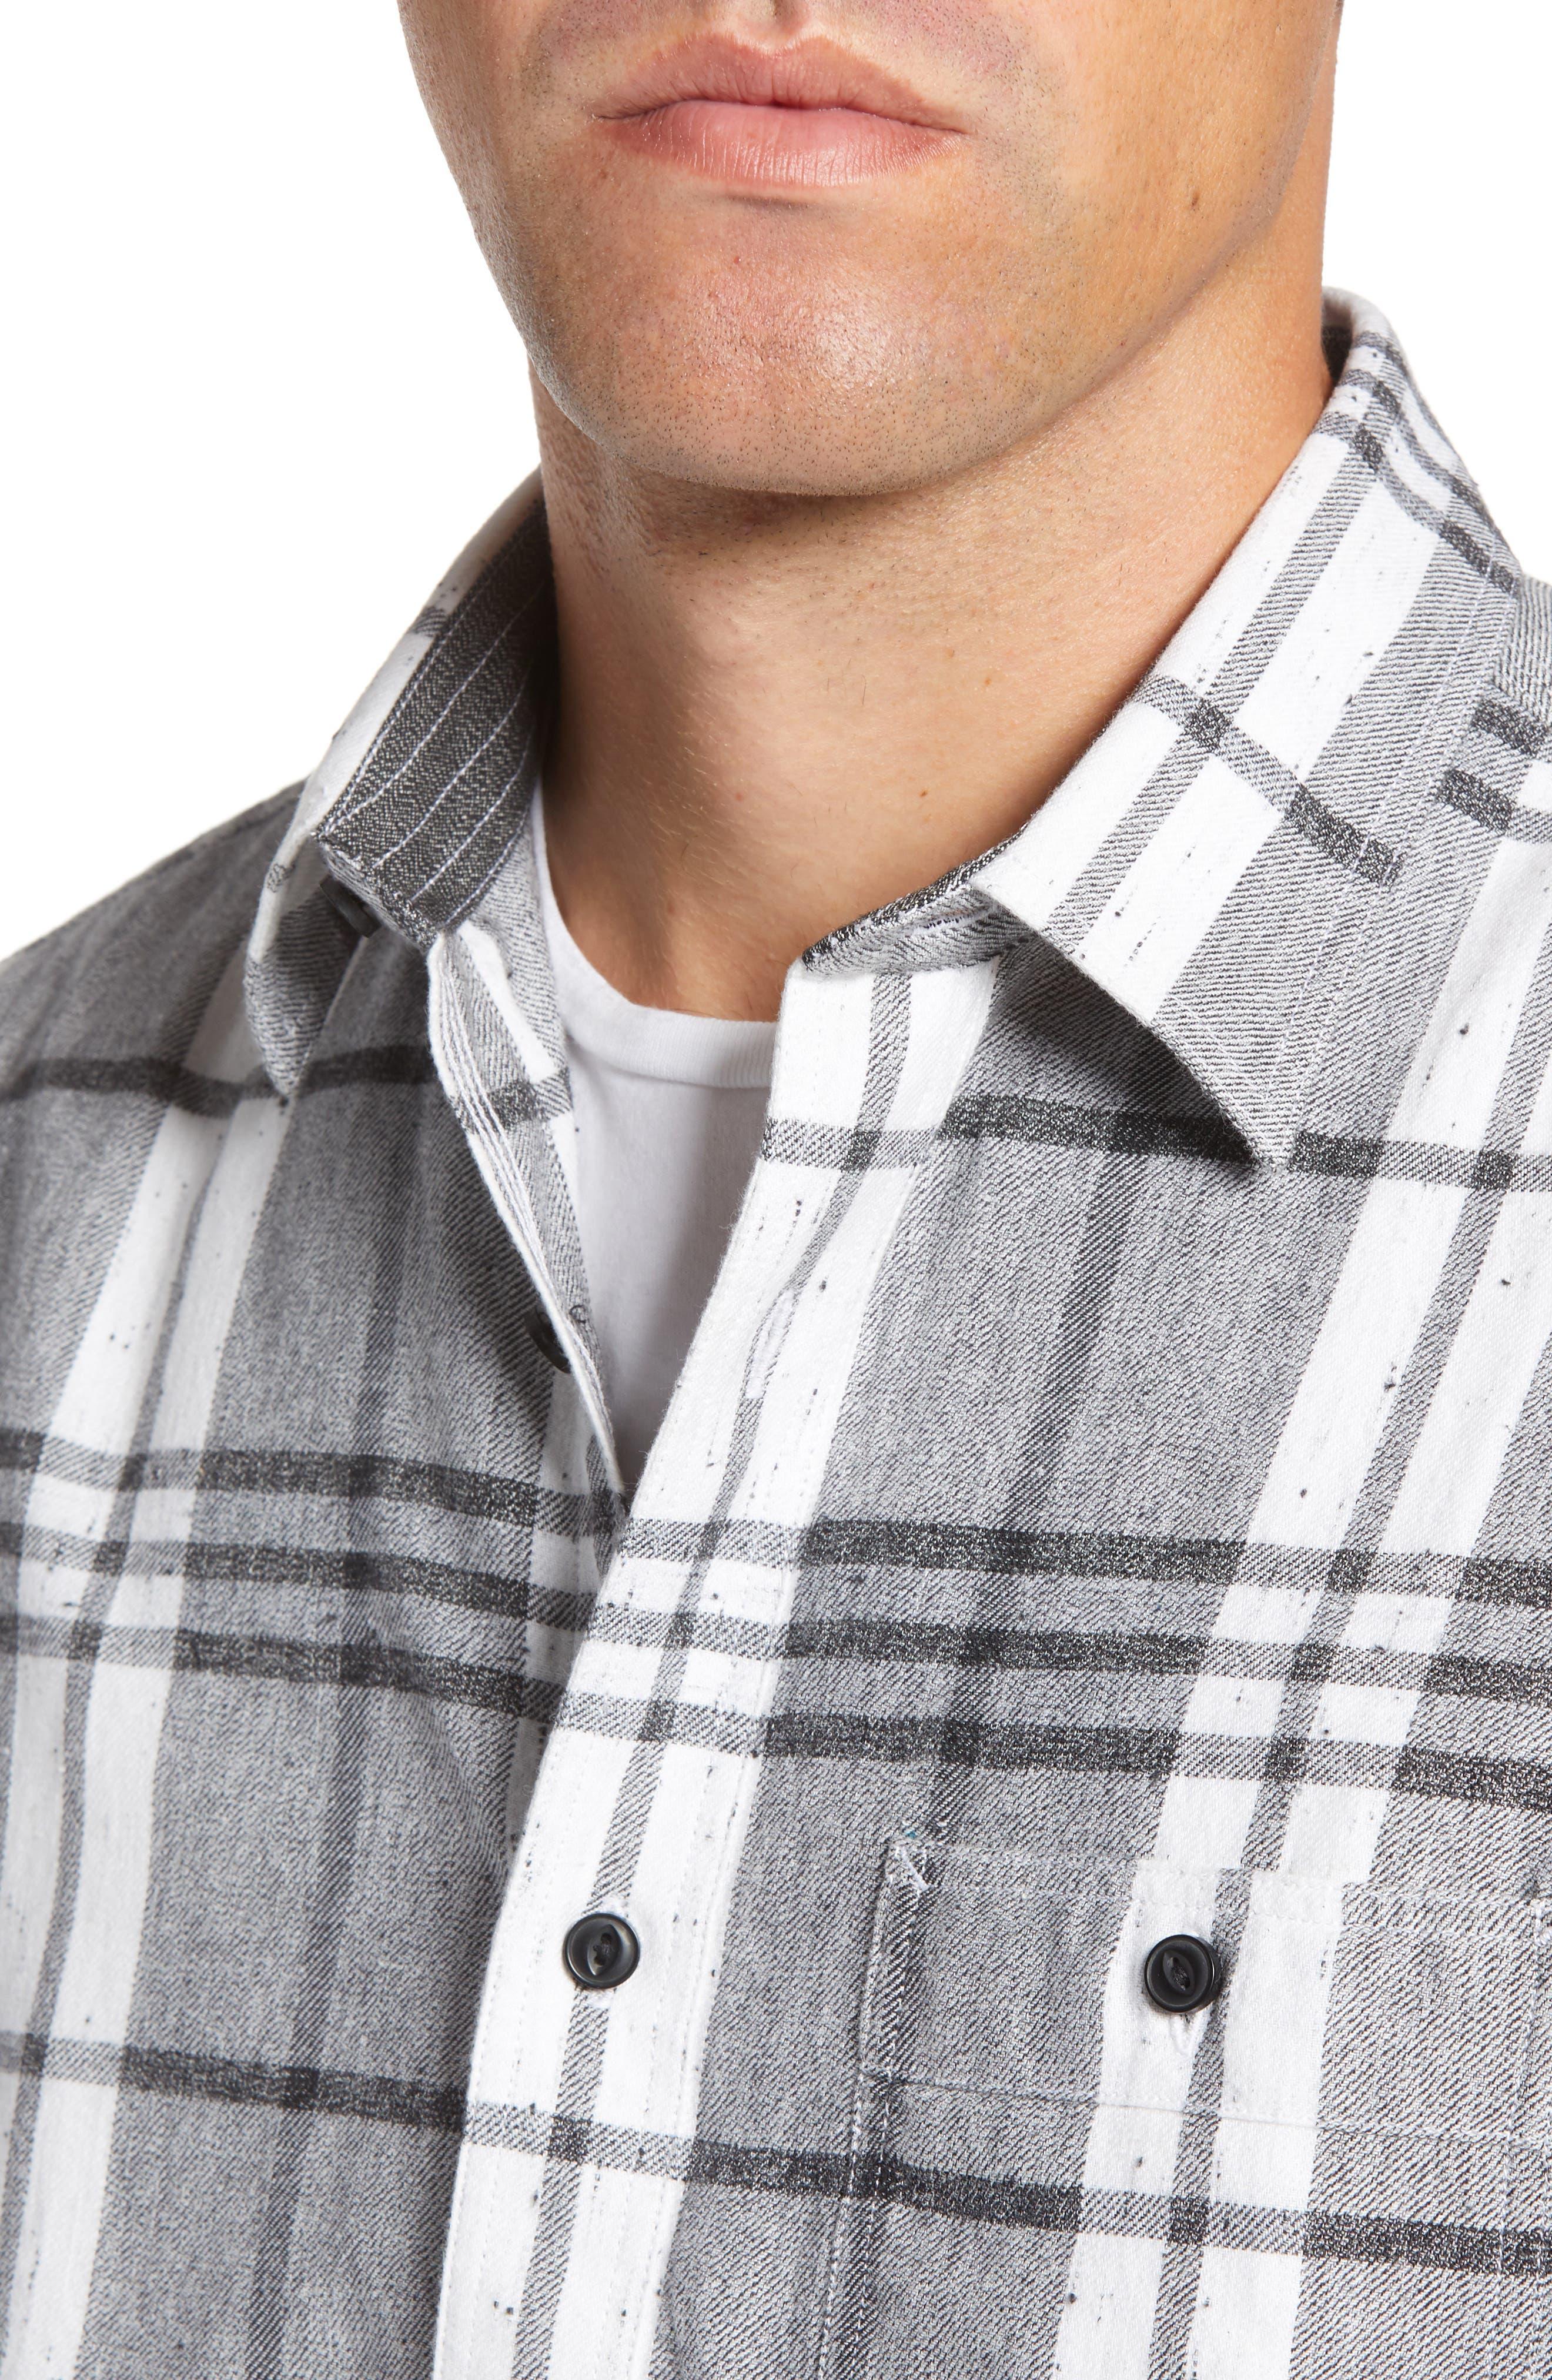 Trim Fit Brushed Plaid Utility Shirt,                             Alternate thumbnail 2, color,                             GREY CASTLEROCK NEP PLAID